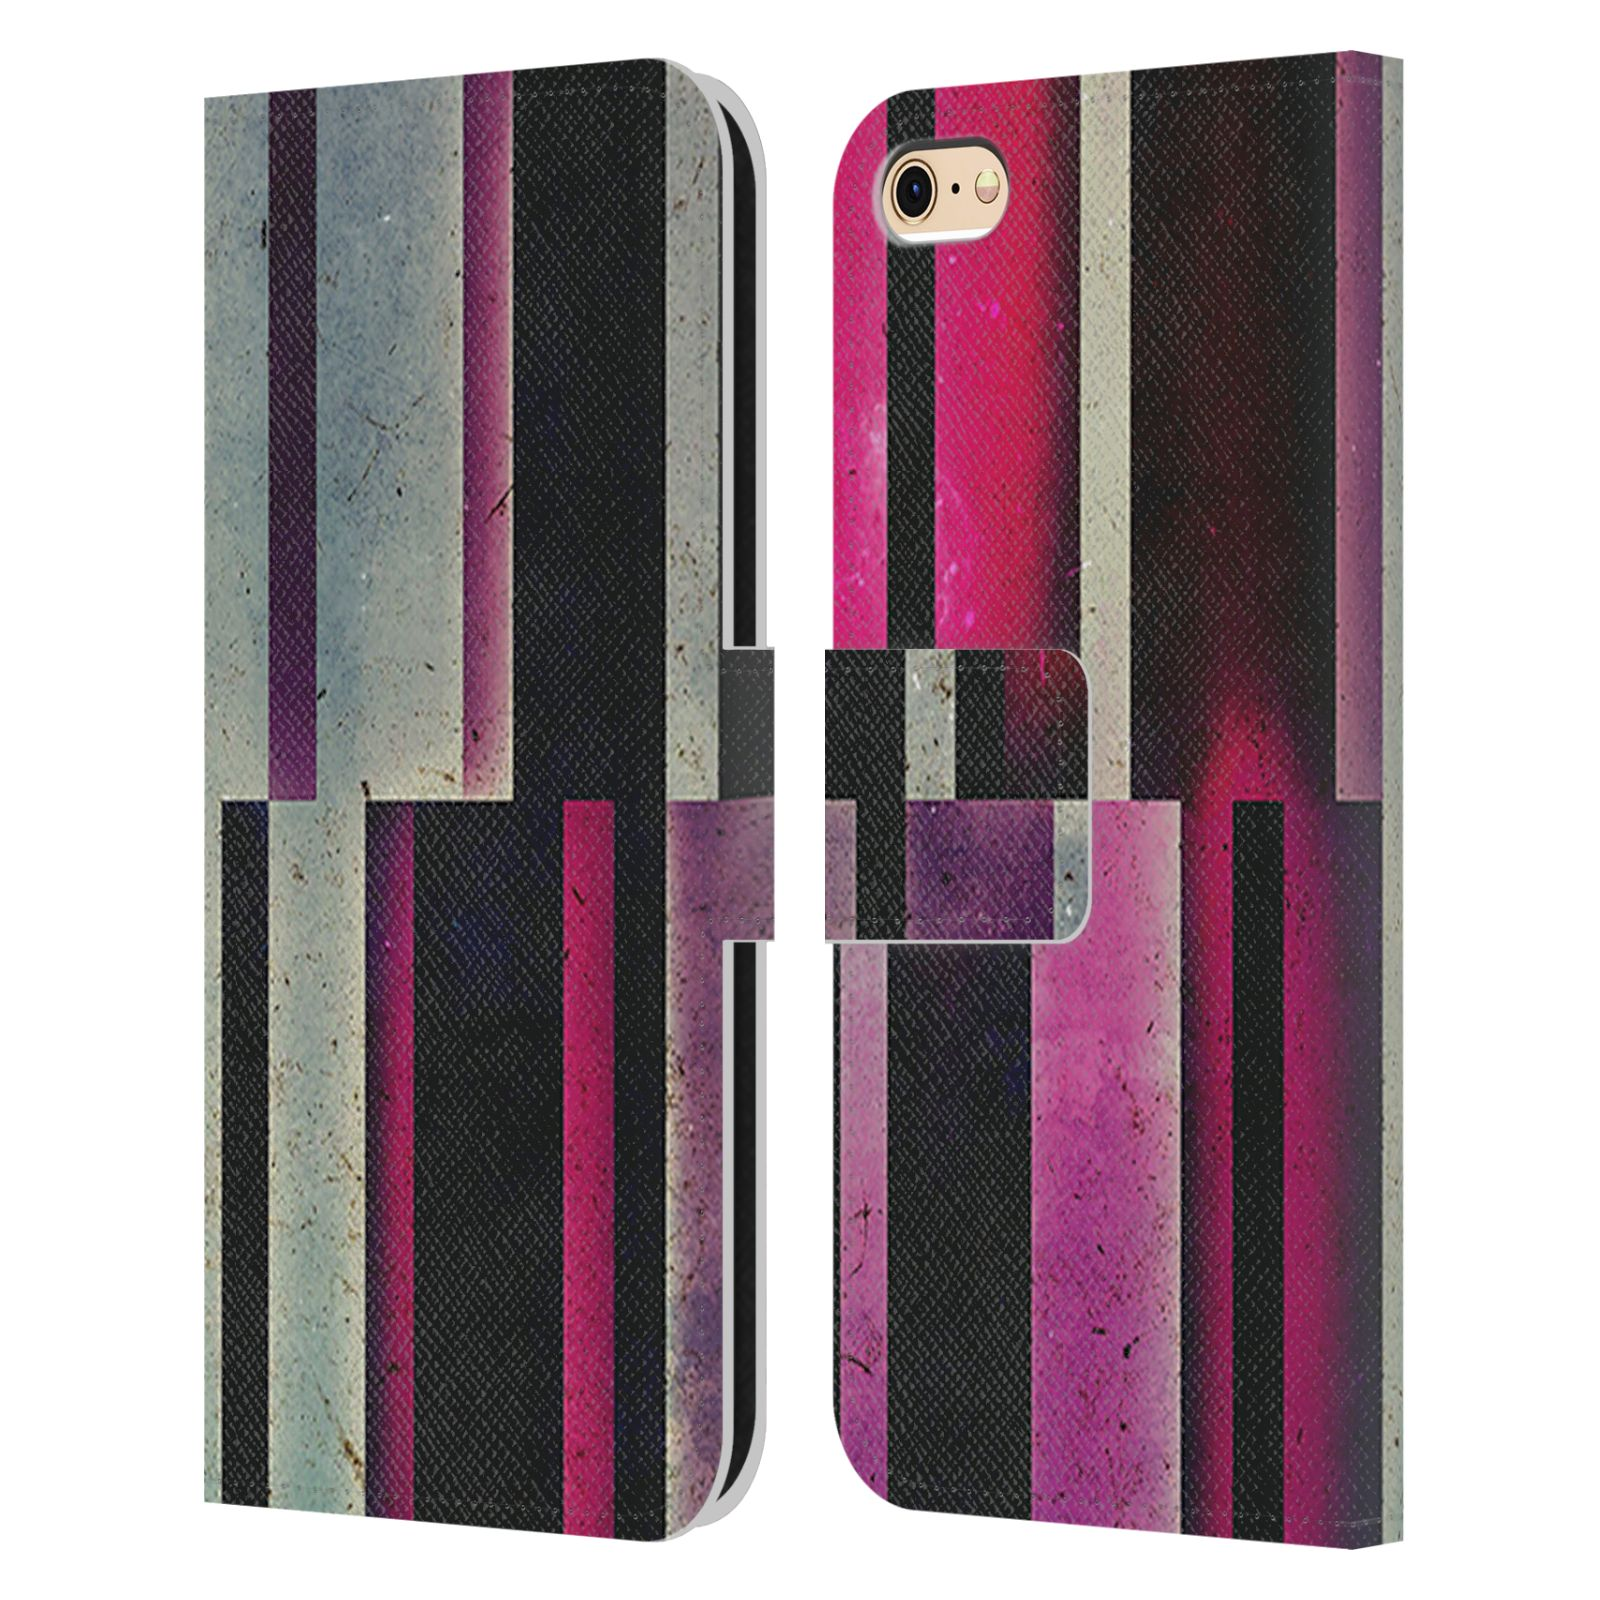 Handyhulle Iphone S Leder